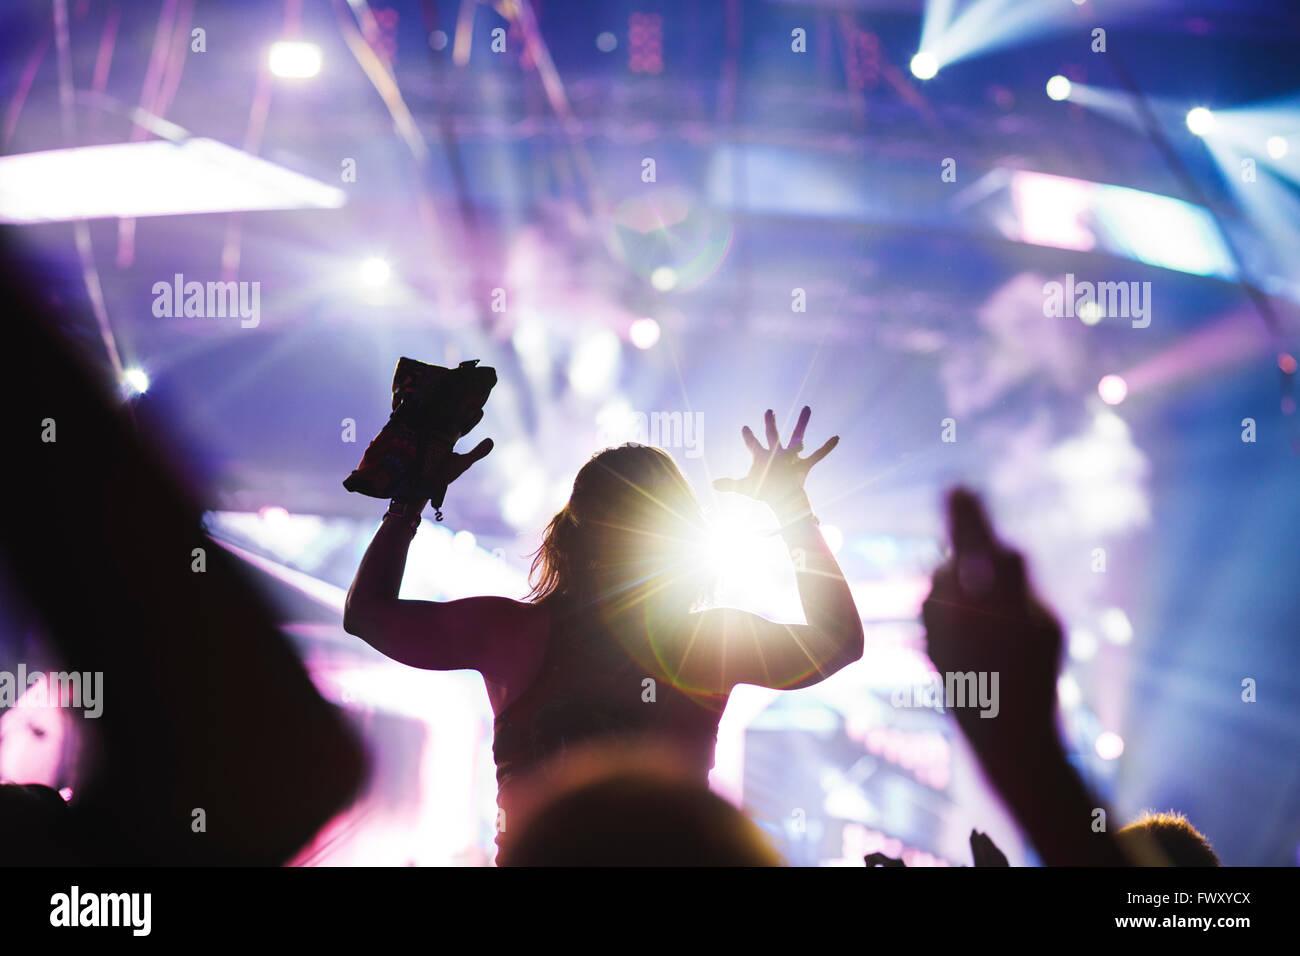 Finnland, Uusimaa, Helsinki, Jubel junge Frau am Summer Sound Festival Stockbild